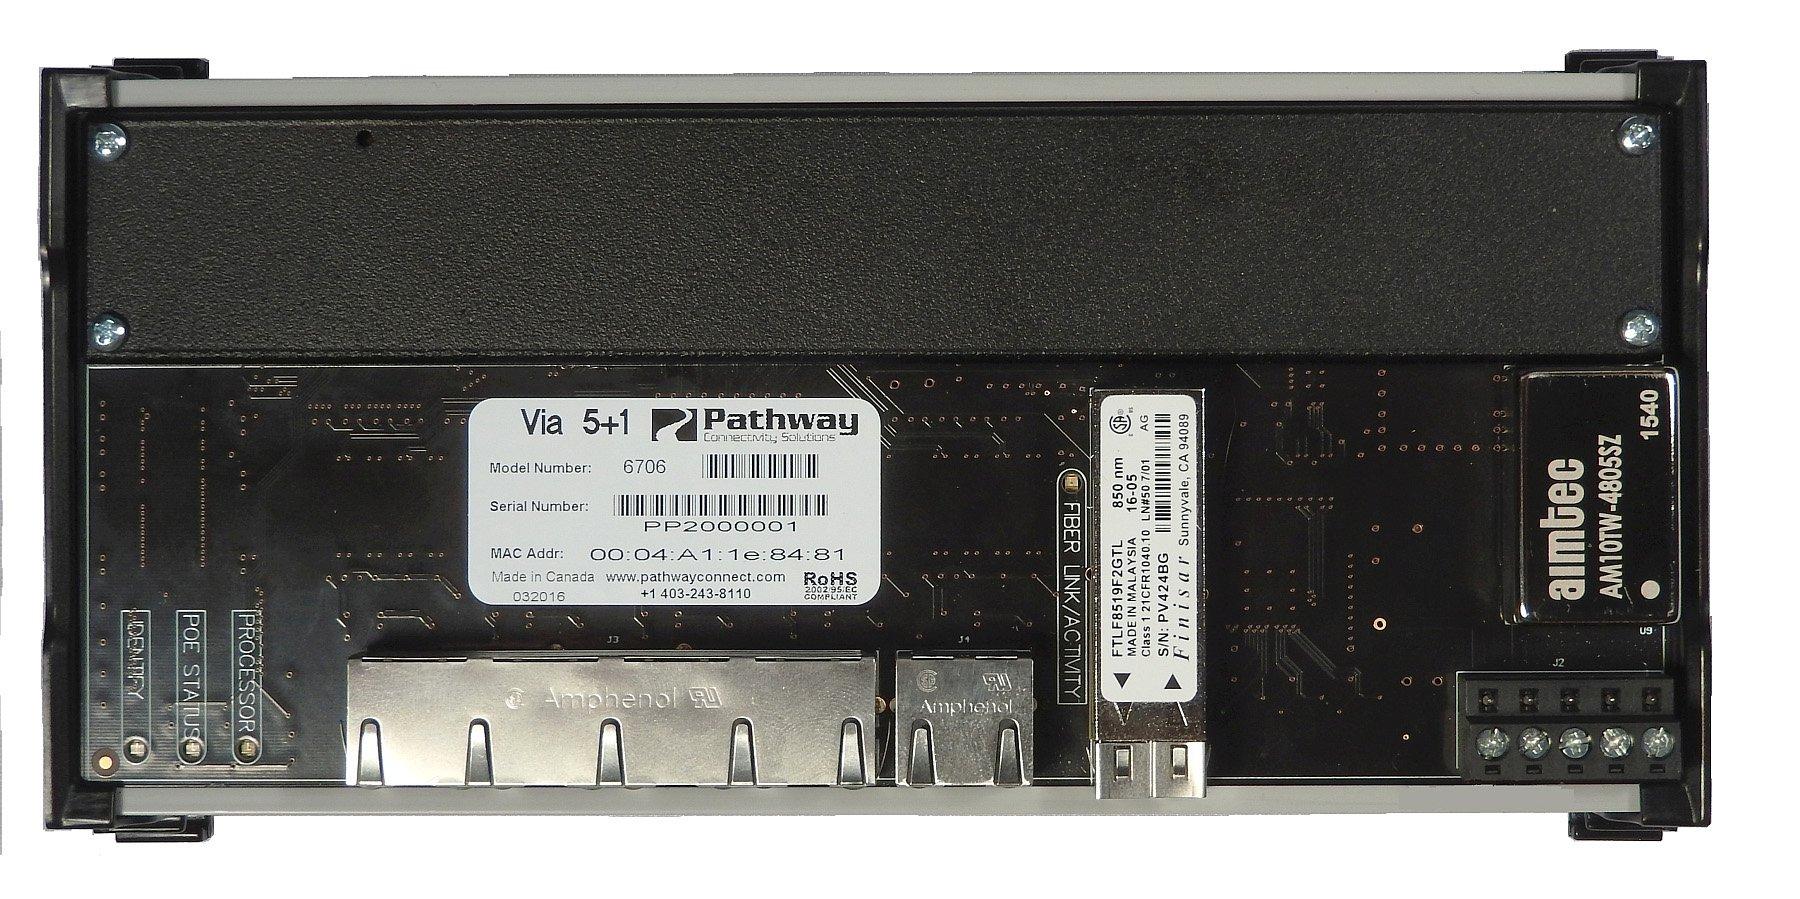 Pathport VIA 5 DIN-Mountable Gigabit Ethernet Switch - No Fiber